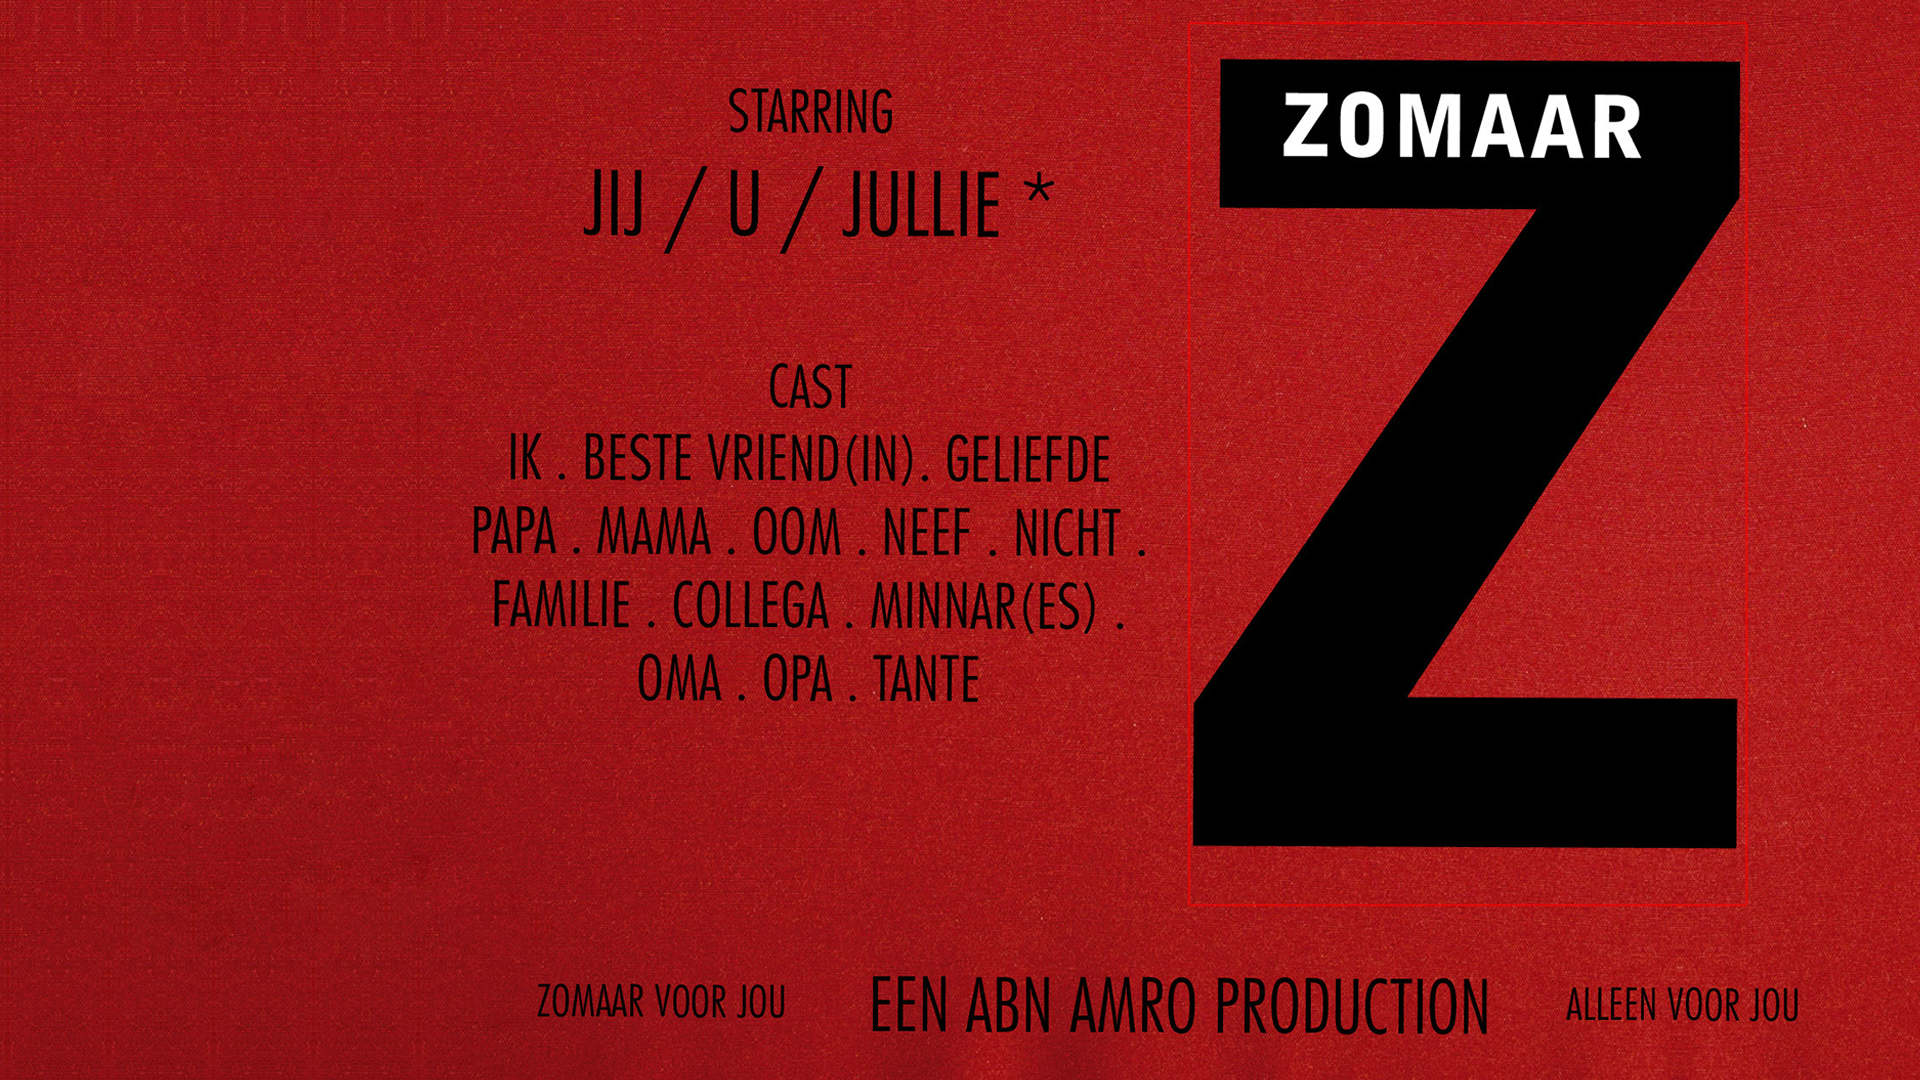 ABN AMRO - Giftcard - Sham Ramessar